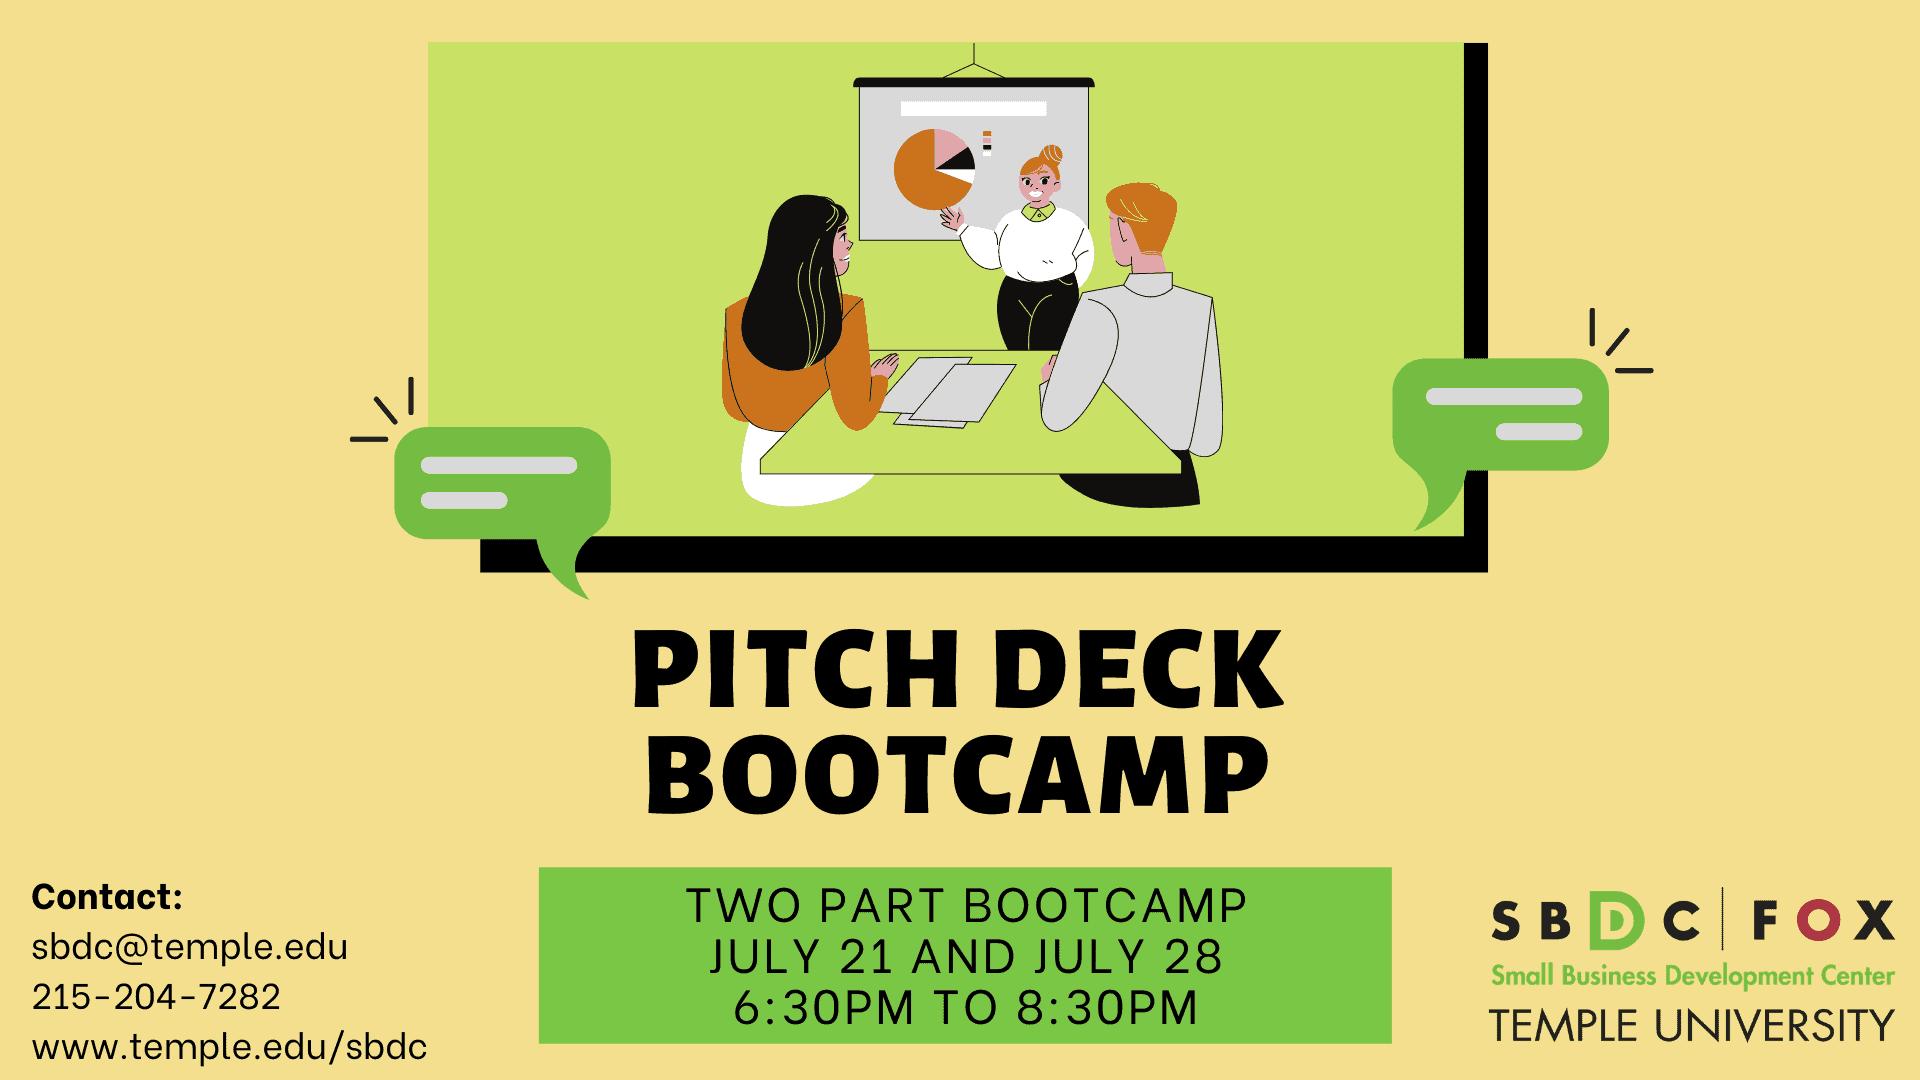 Pitch Deck Bootcamp